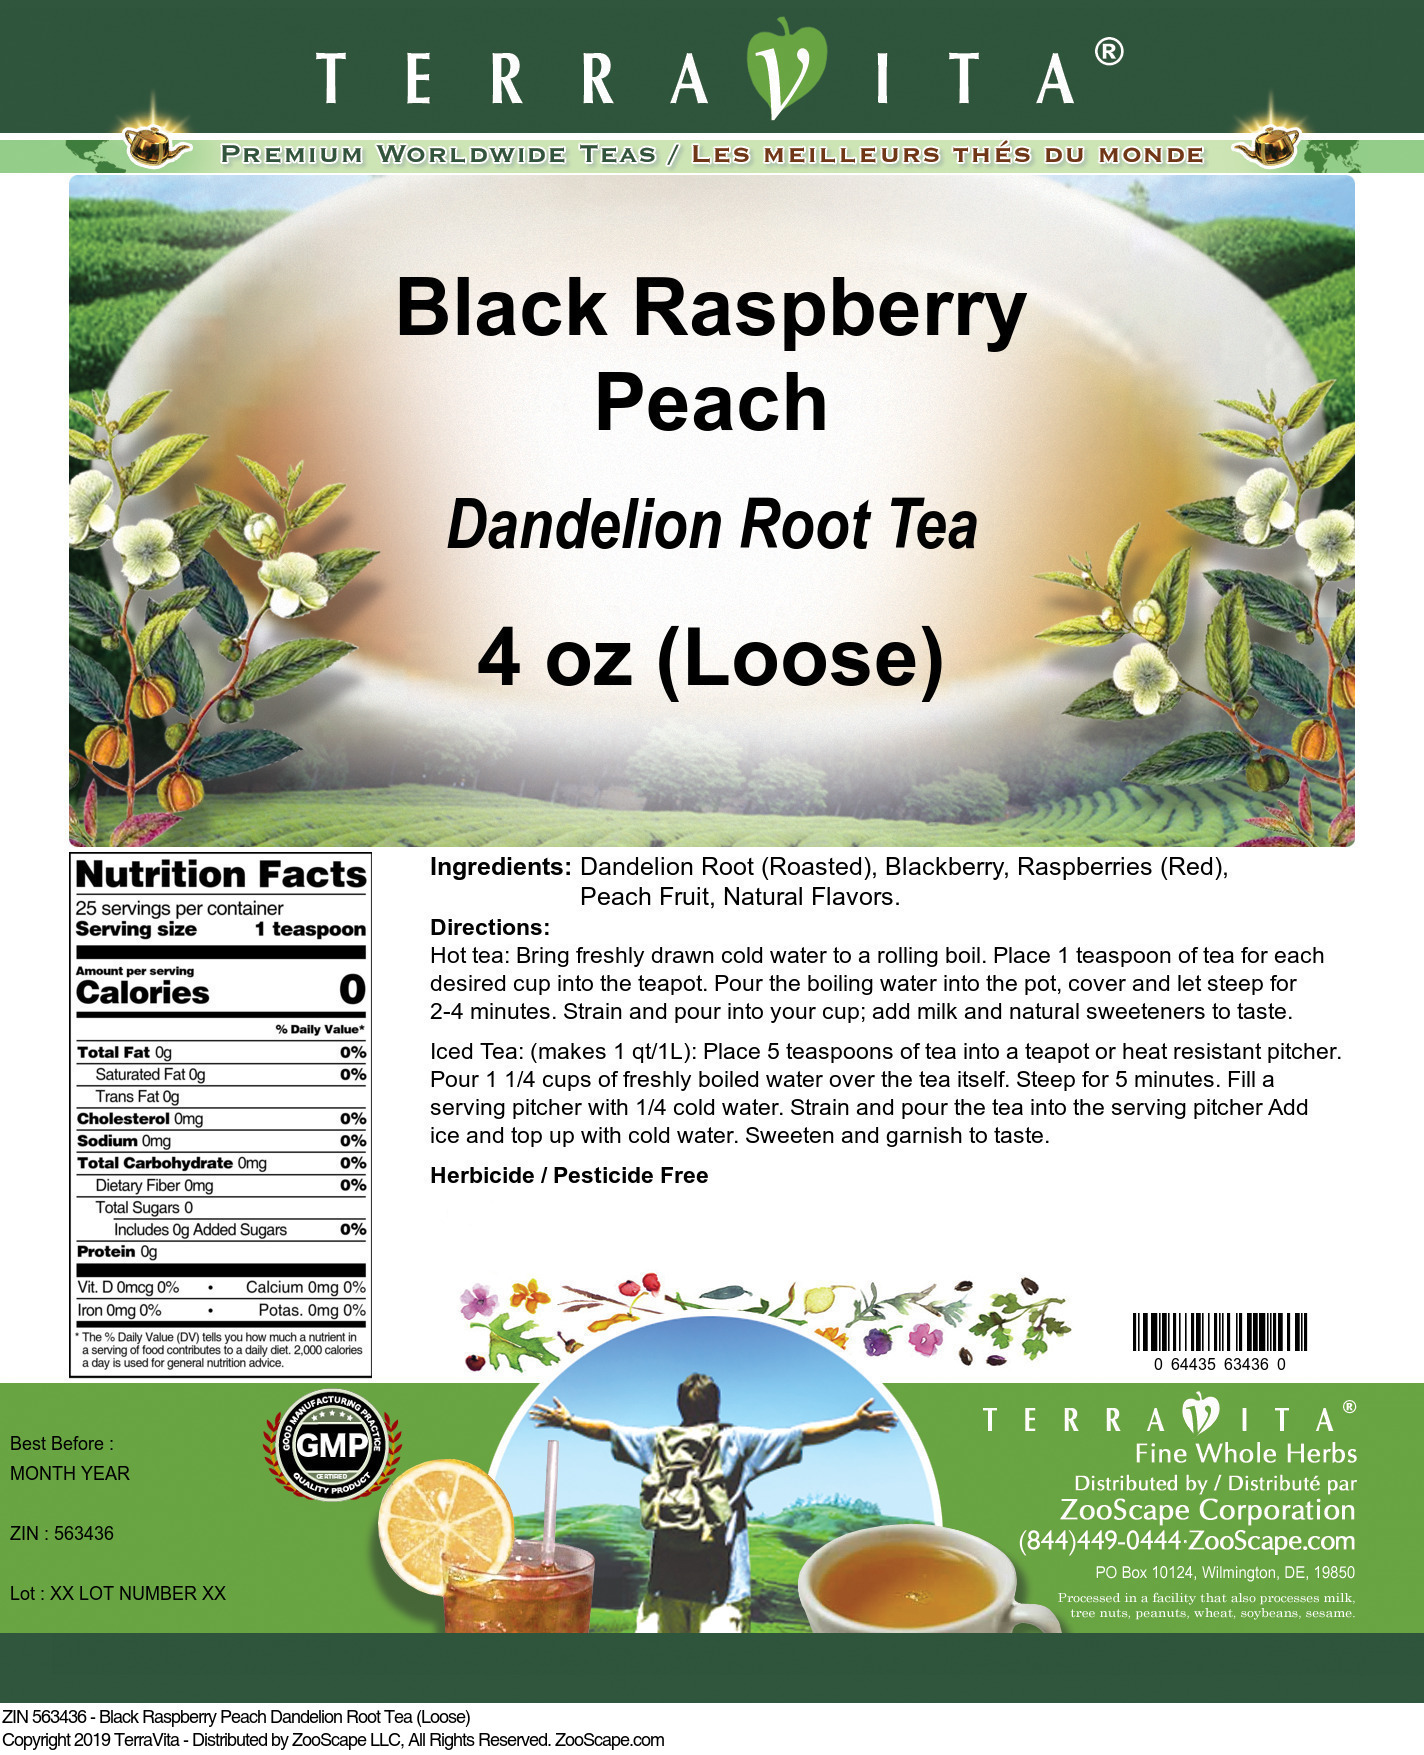 Black Raspberry Peach Dandelion Root Tea (Loose)